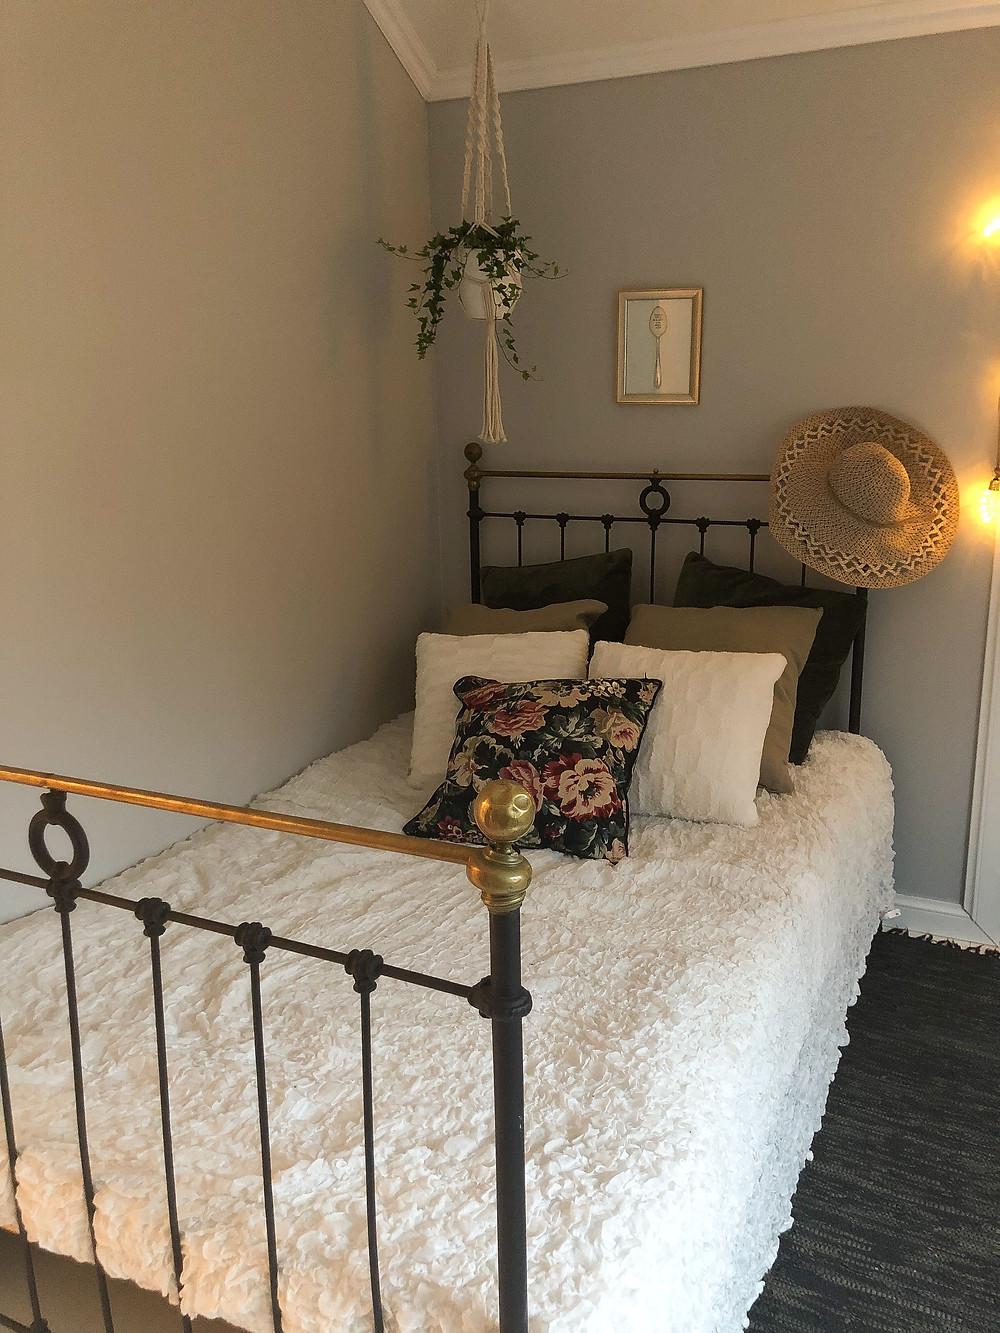 kukkatyyny, amppeli ja räsymatto nahkaa, loral pillow with leather rag rug and hanging plant